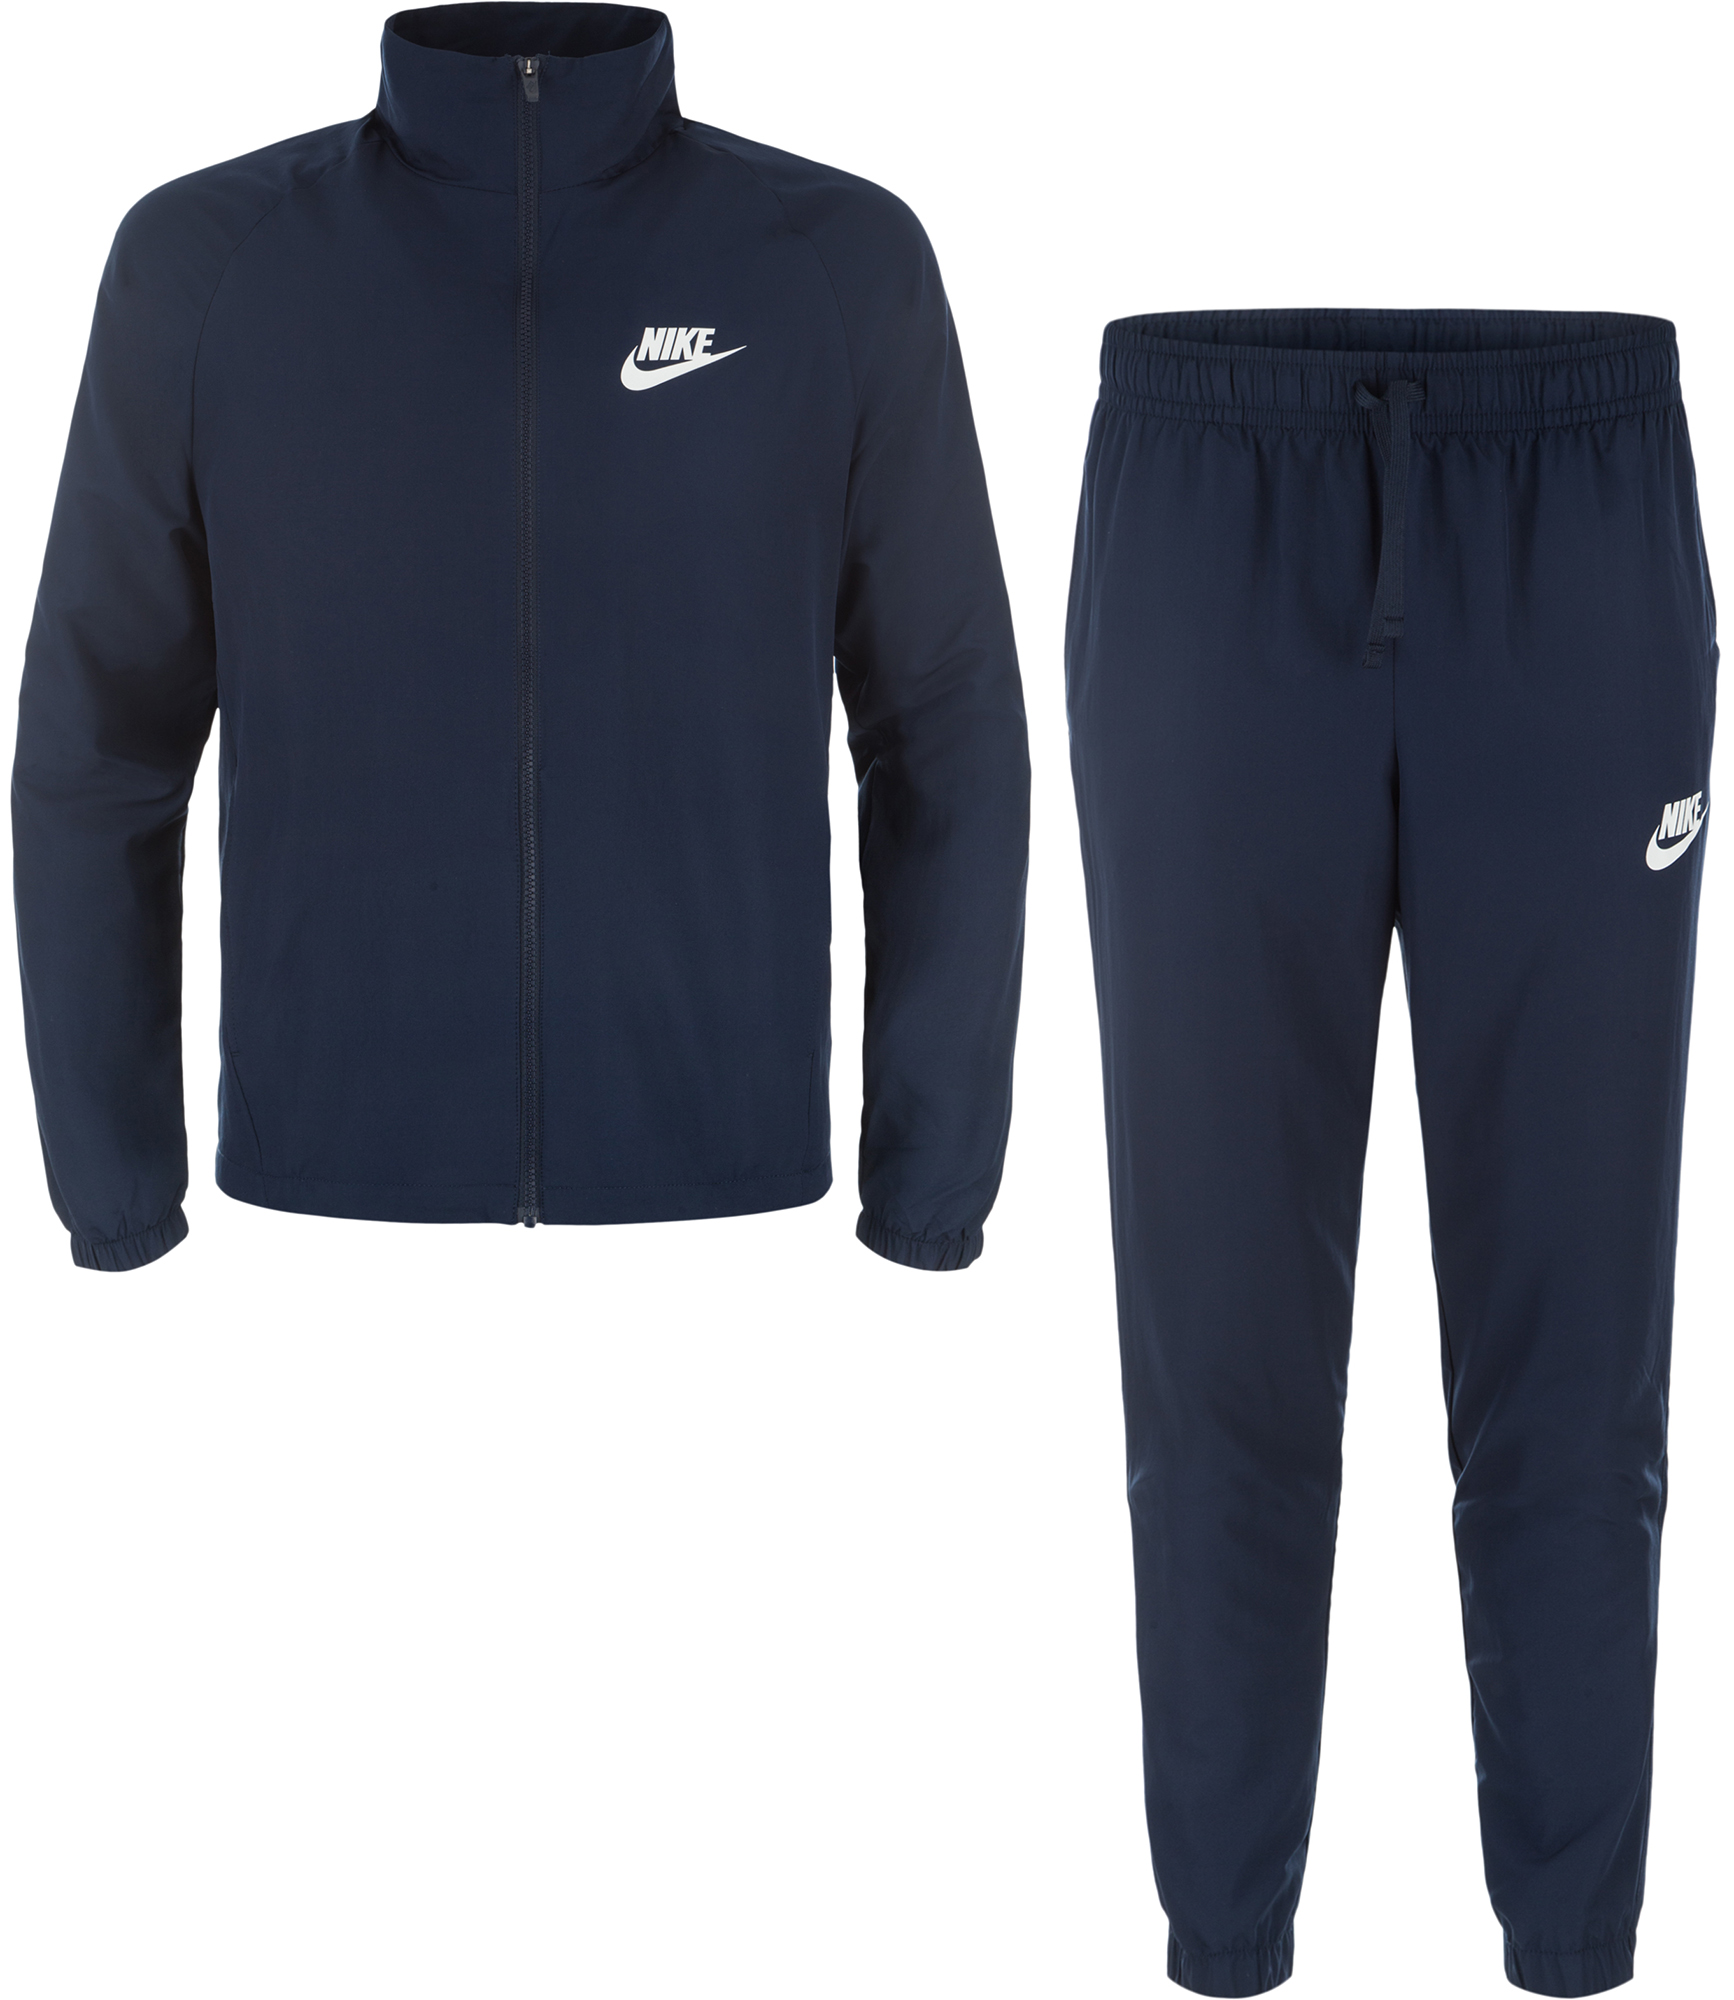 Nike Костюм спортивный мужской Nike Sportswear купить фирменный мужской спортивный костюм